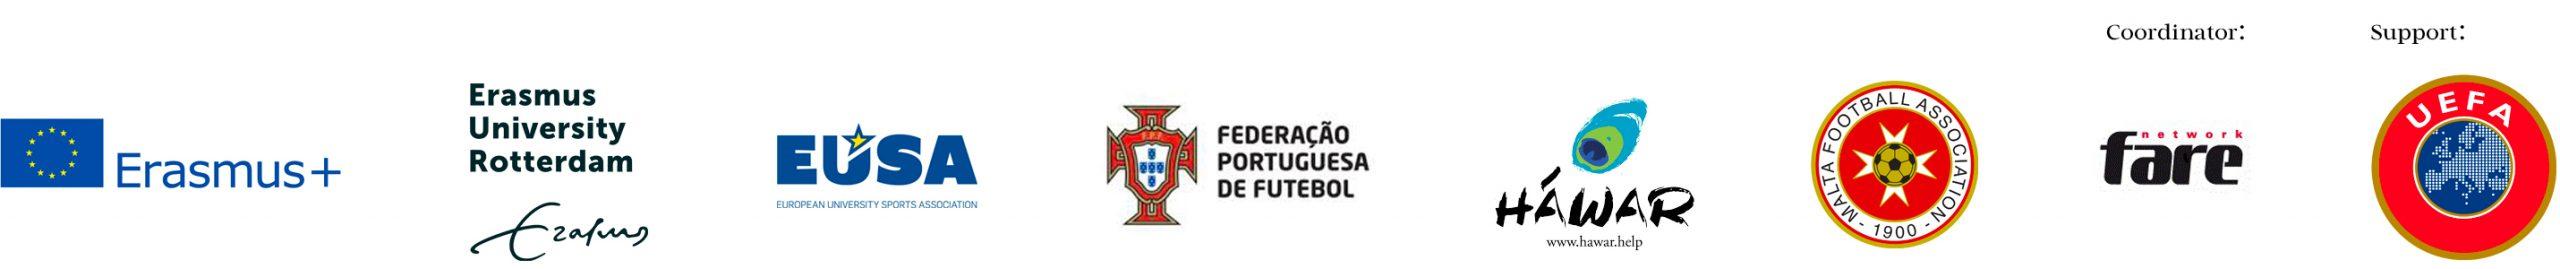 iFlipp partners logos: Erasmus+, Erasmus University of Roterdam, Portuguese FA, Hawar.Help, Malta Football Association, Fare Network (coordinator), UEFA (supporter)